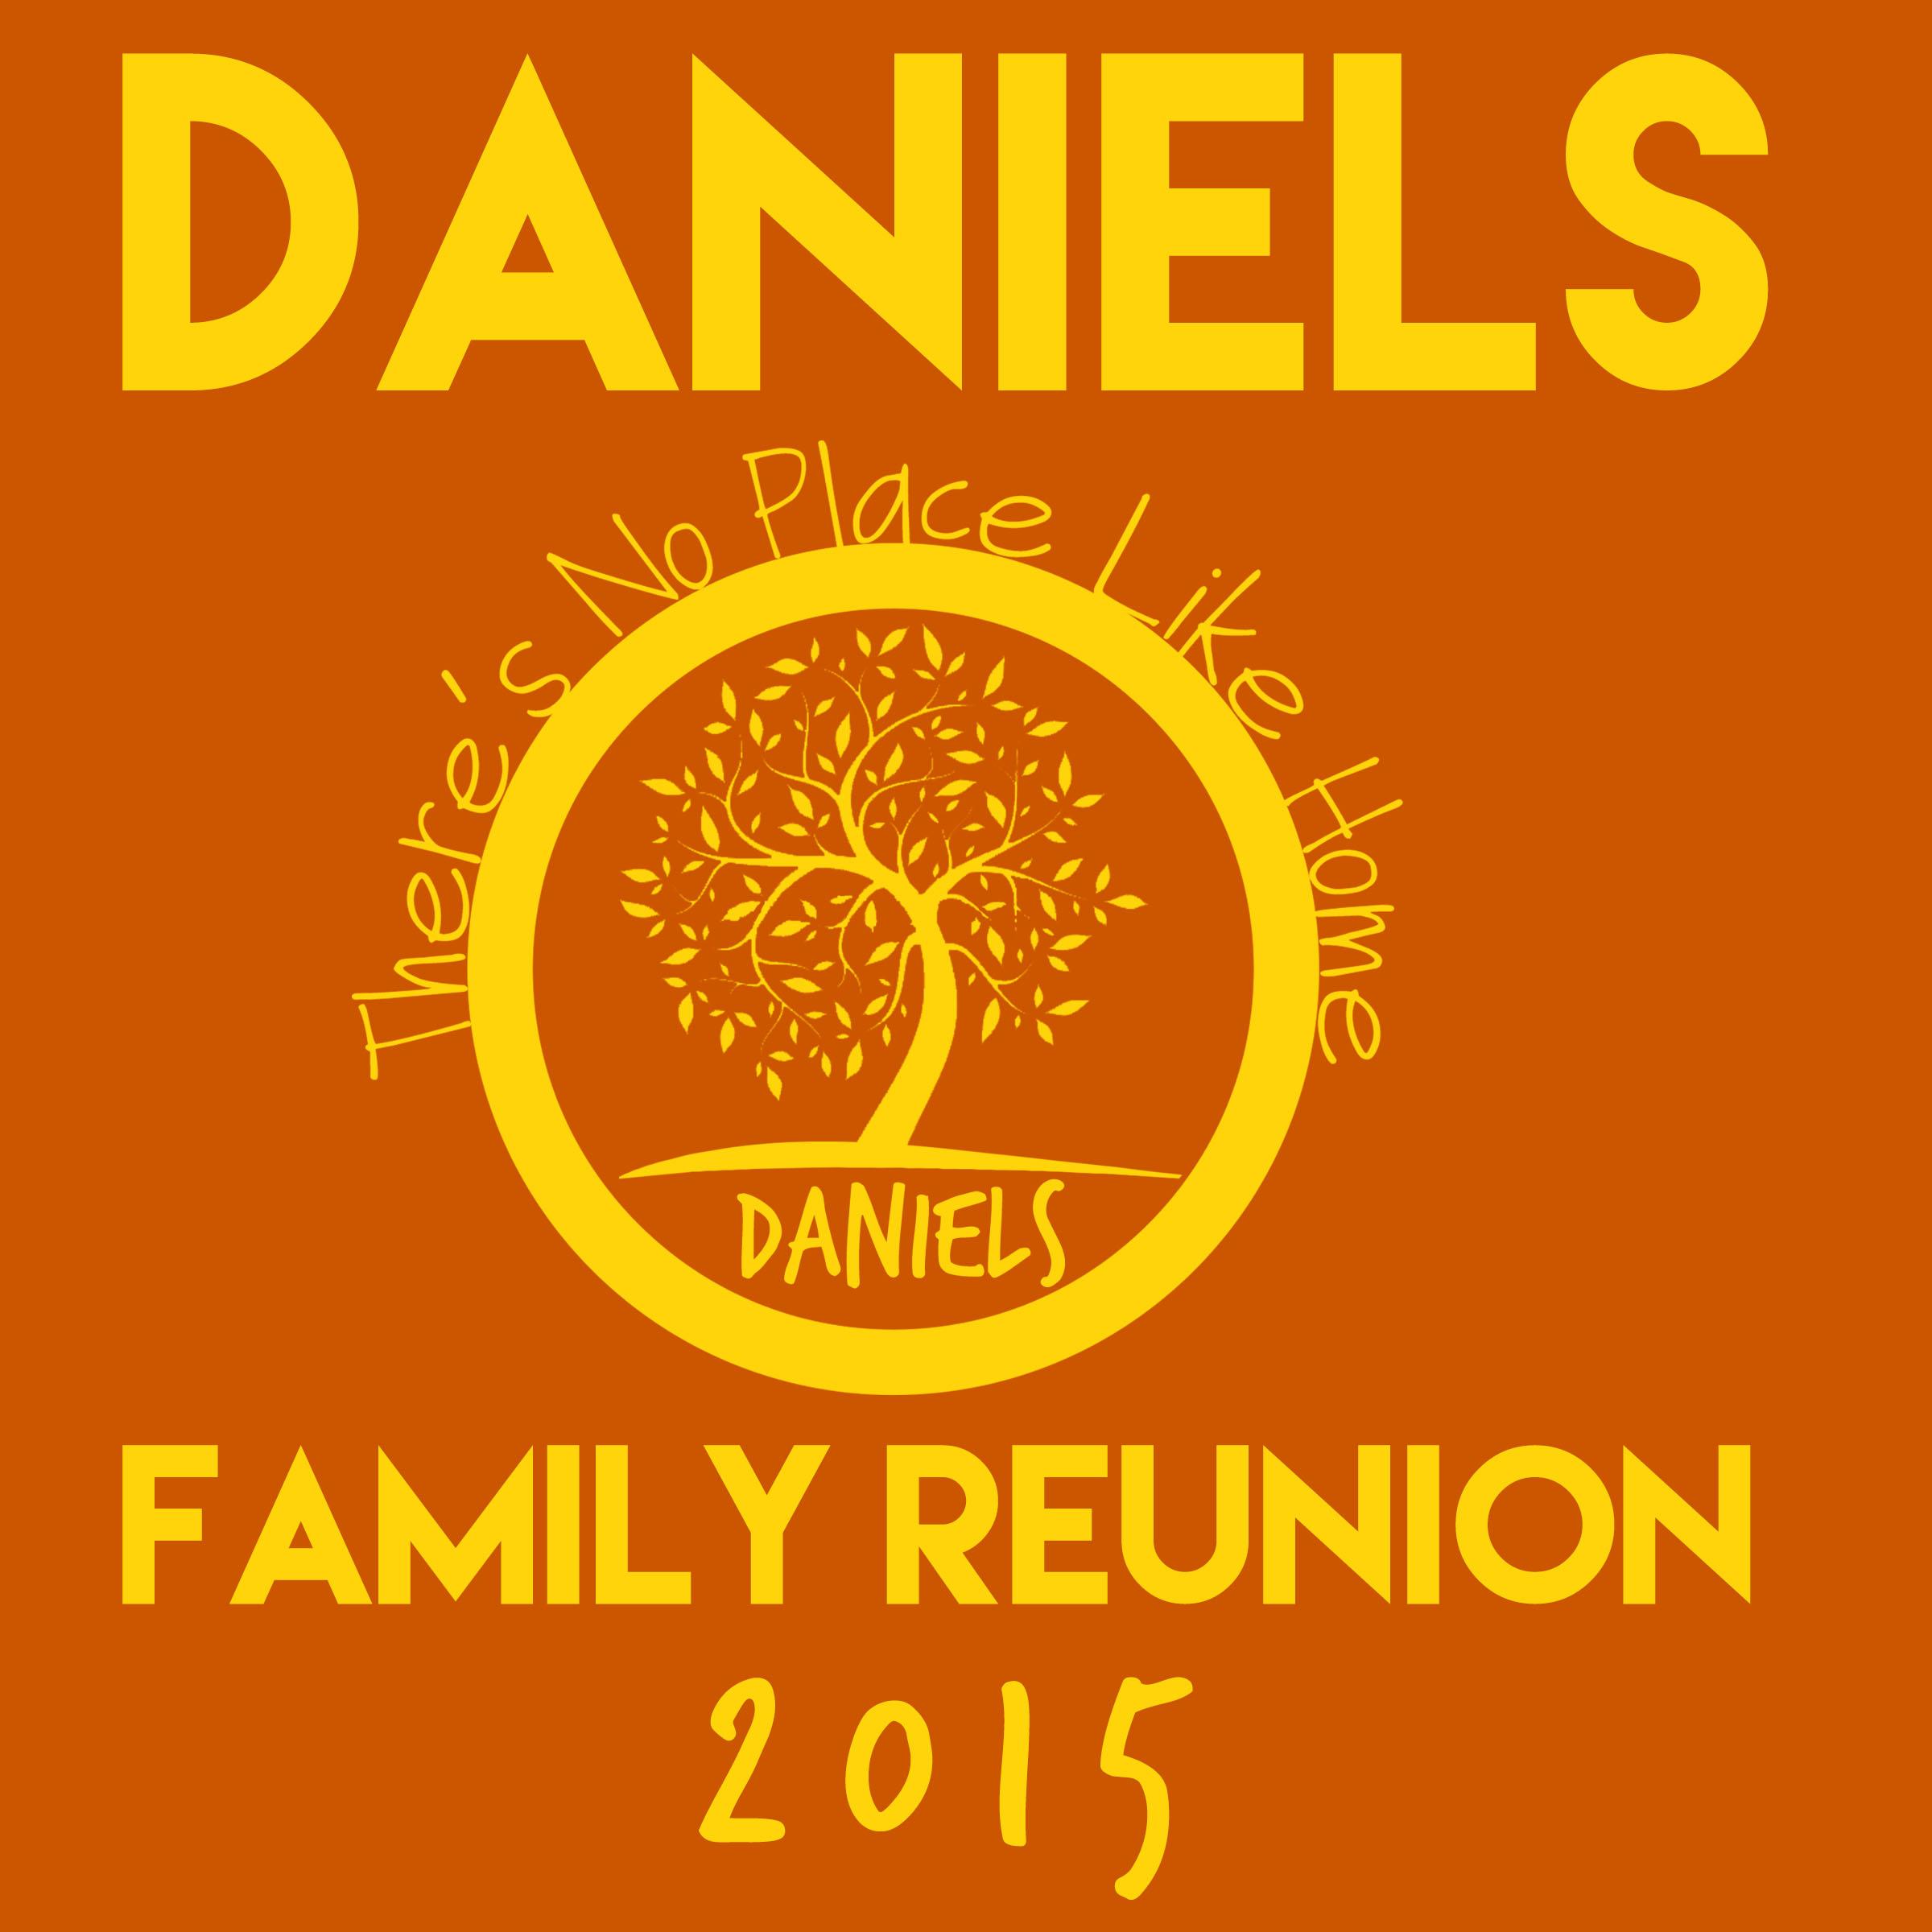 Daniels Family Reunion Logo2.jpg